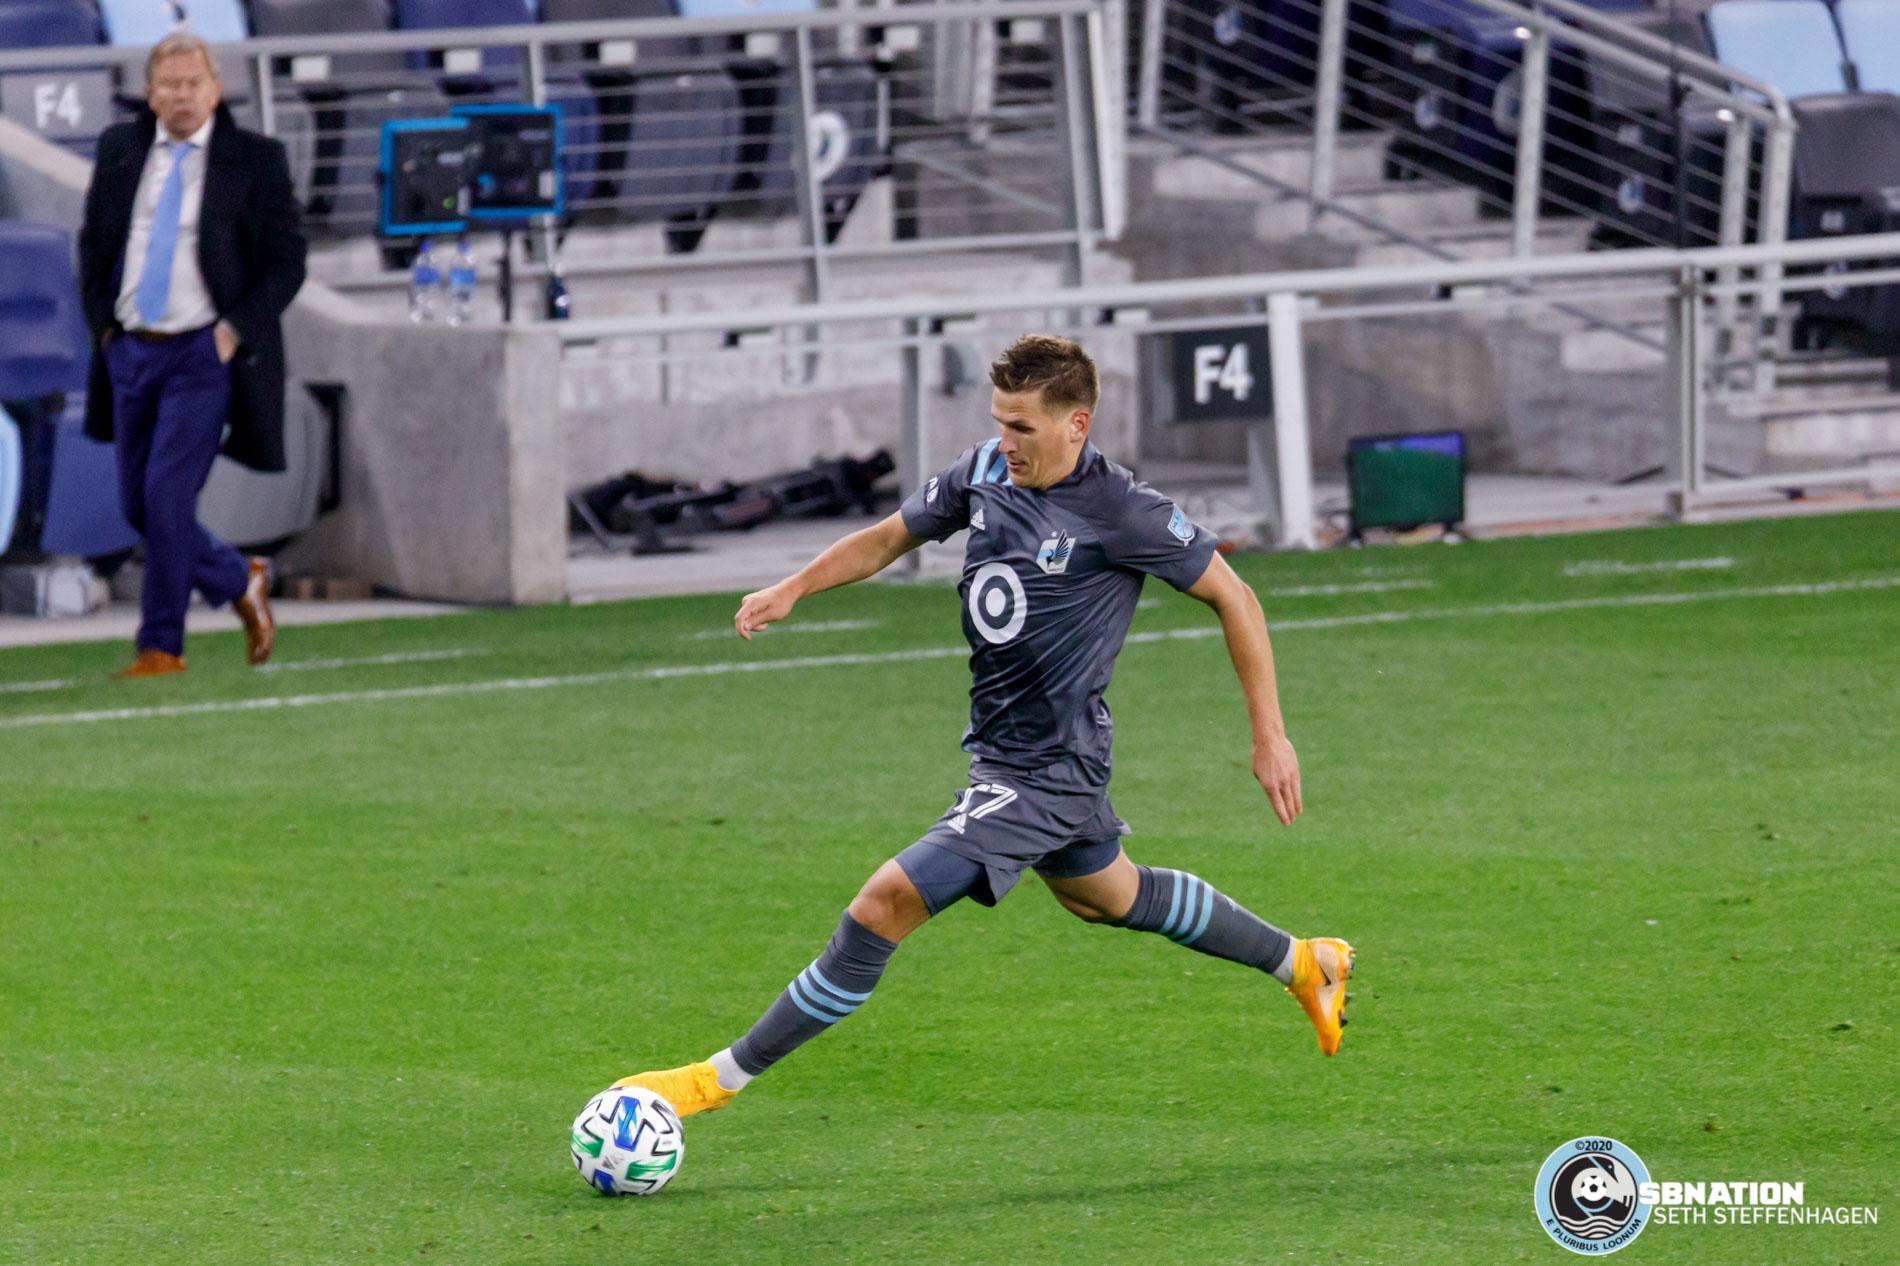 October 3, 2020 - Saint Paul, Minnesota, United States - Minnesota United midfielder Robin Lod (17) dribbles the ball during the match against FC Cincinnati at Allianz Field.